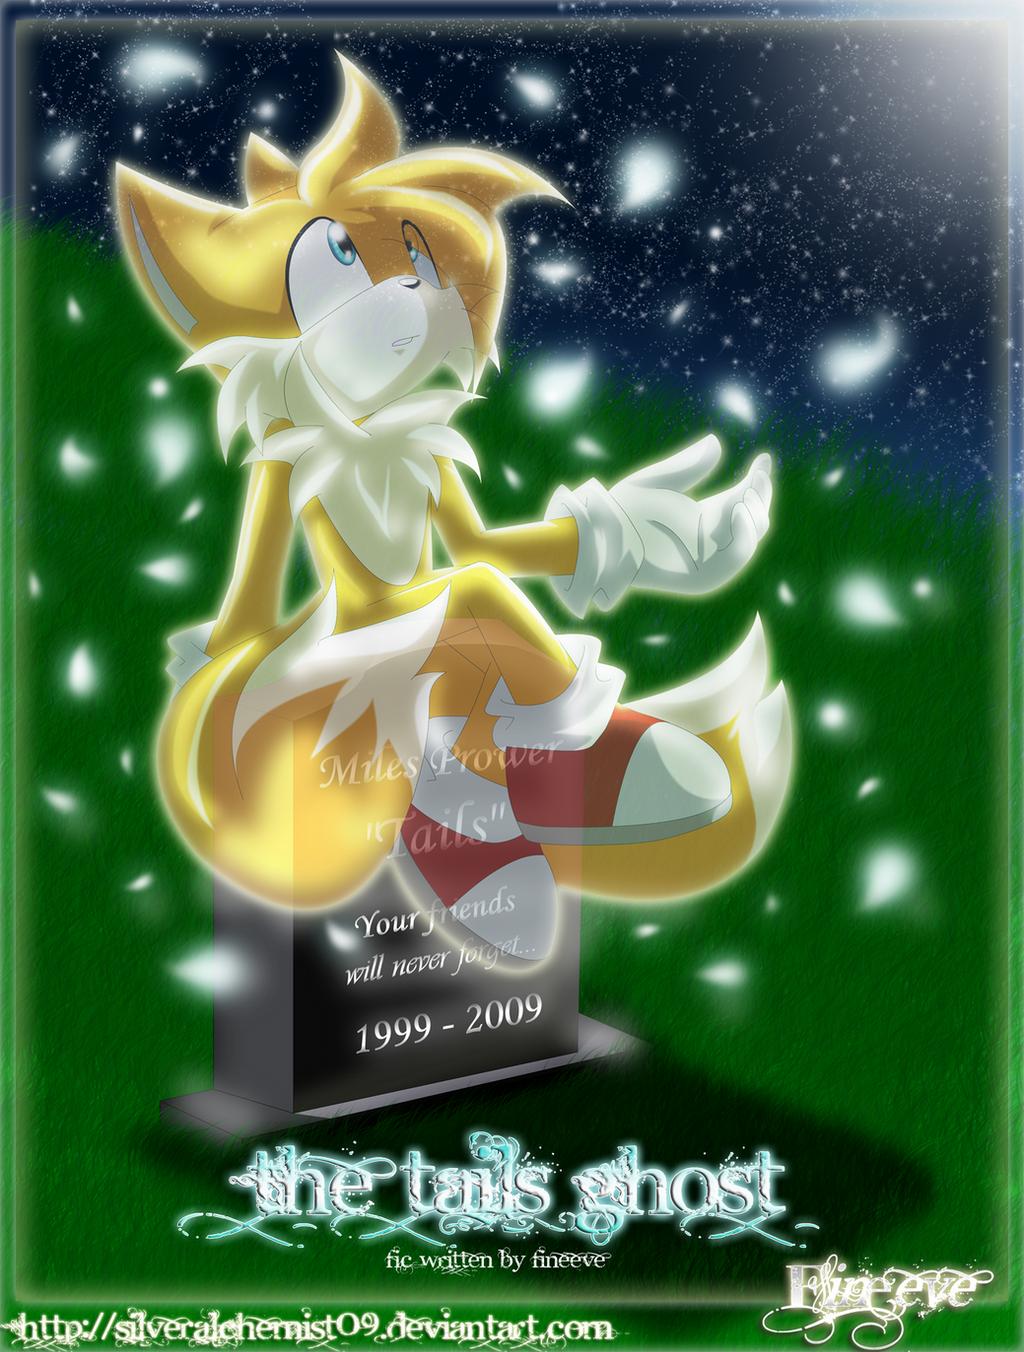 TTG - Poster aniversary 2011 by SilverAlchemist09